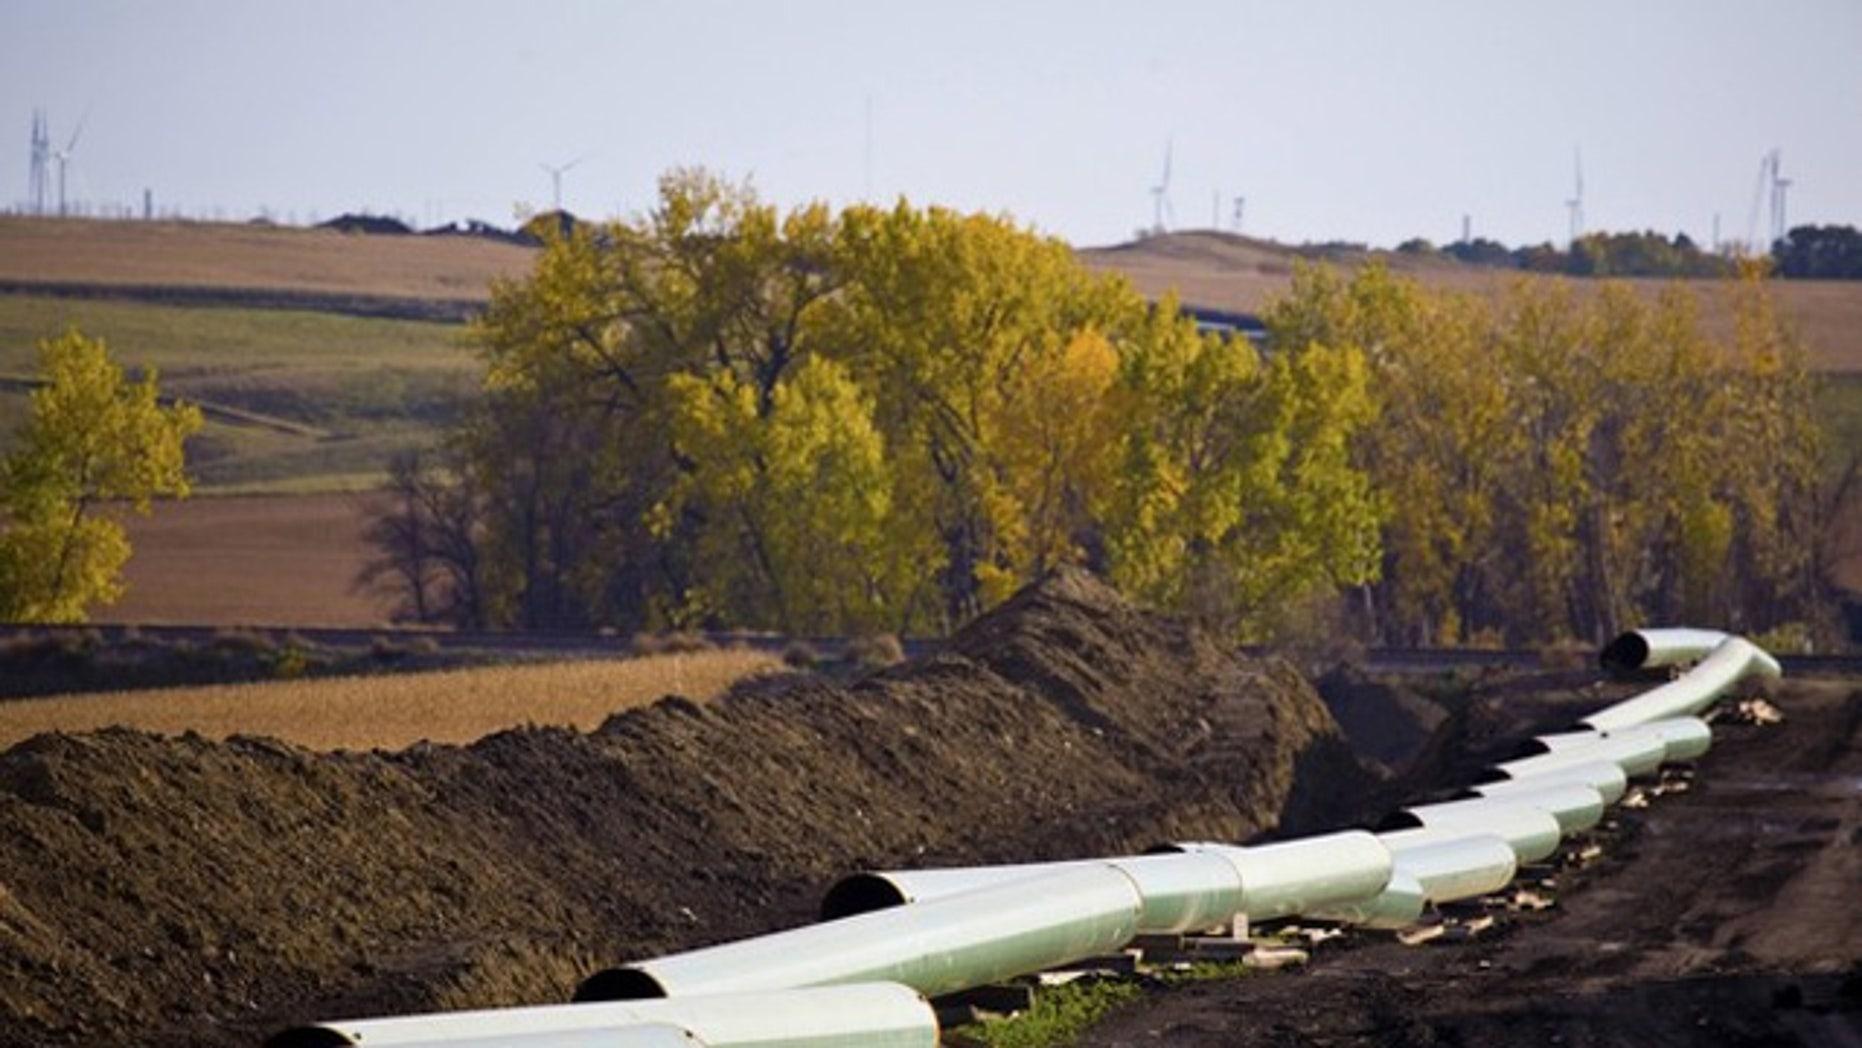 The Keystone XL Pipelin is show under construction in North Dakota